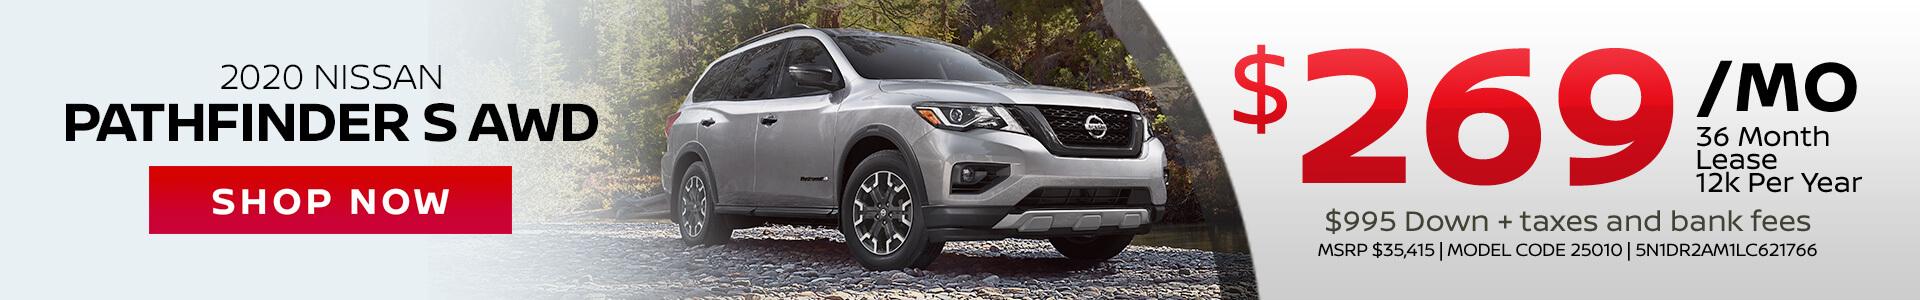 Nissan Pathfinder $269 Lease